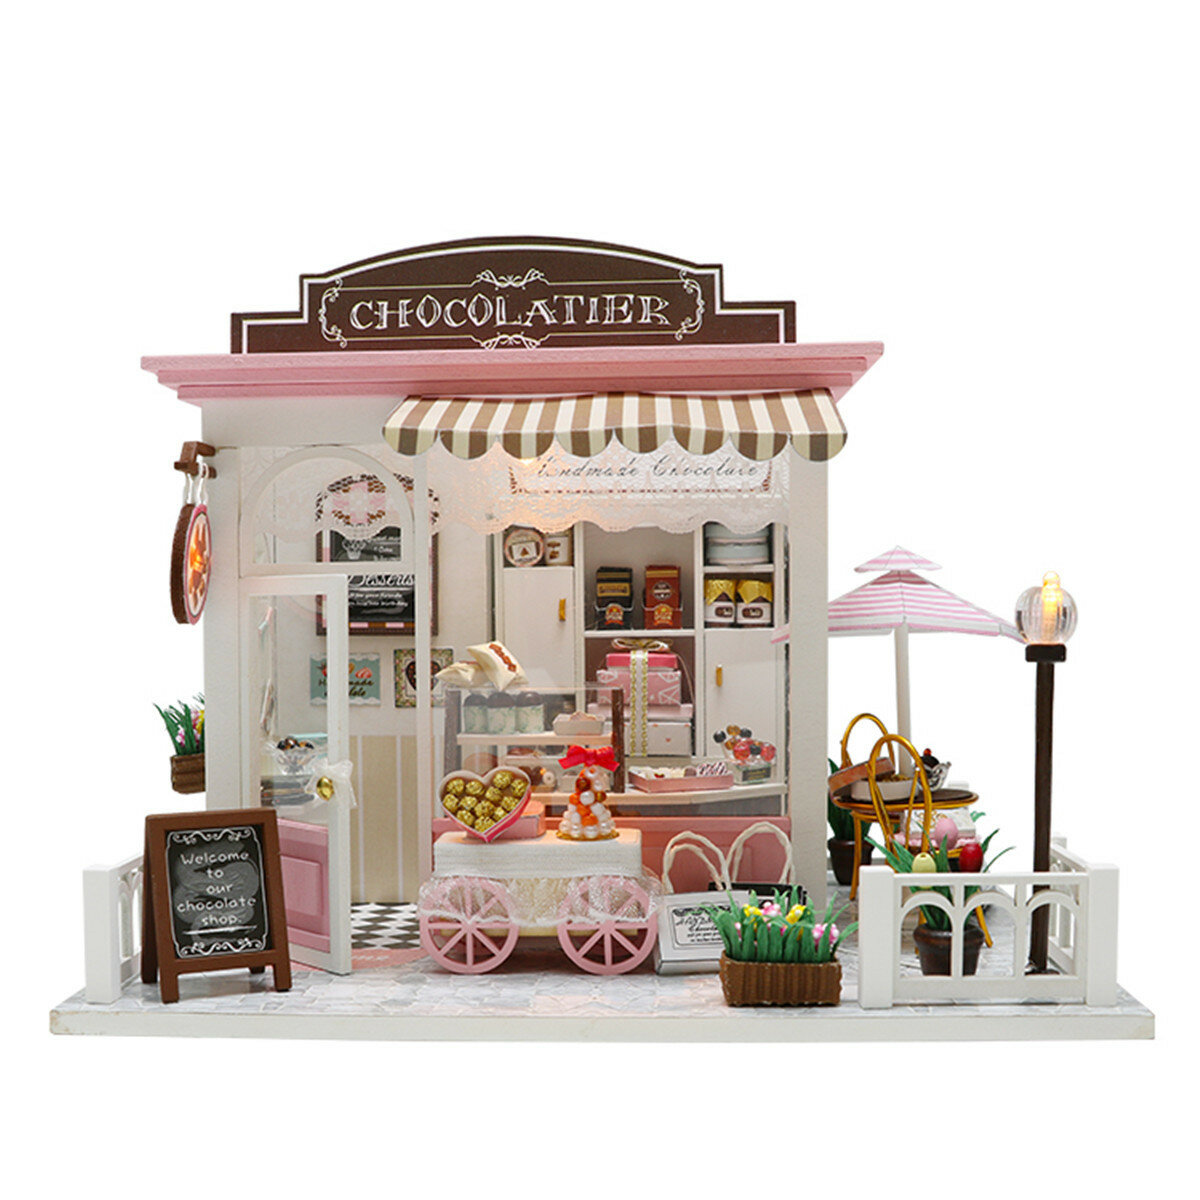 Doll House Kit DIY Miniature Wooden Handmade House Cake Shop Kids Craft Toys